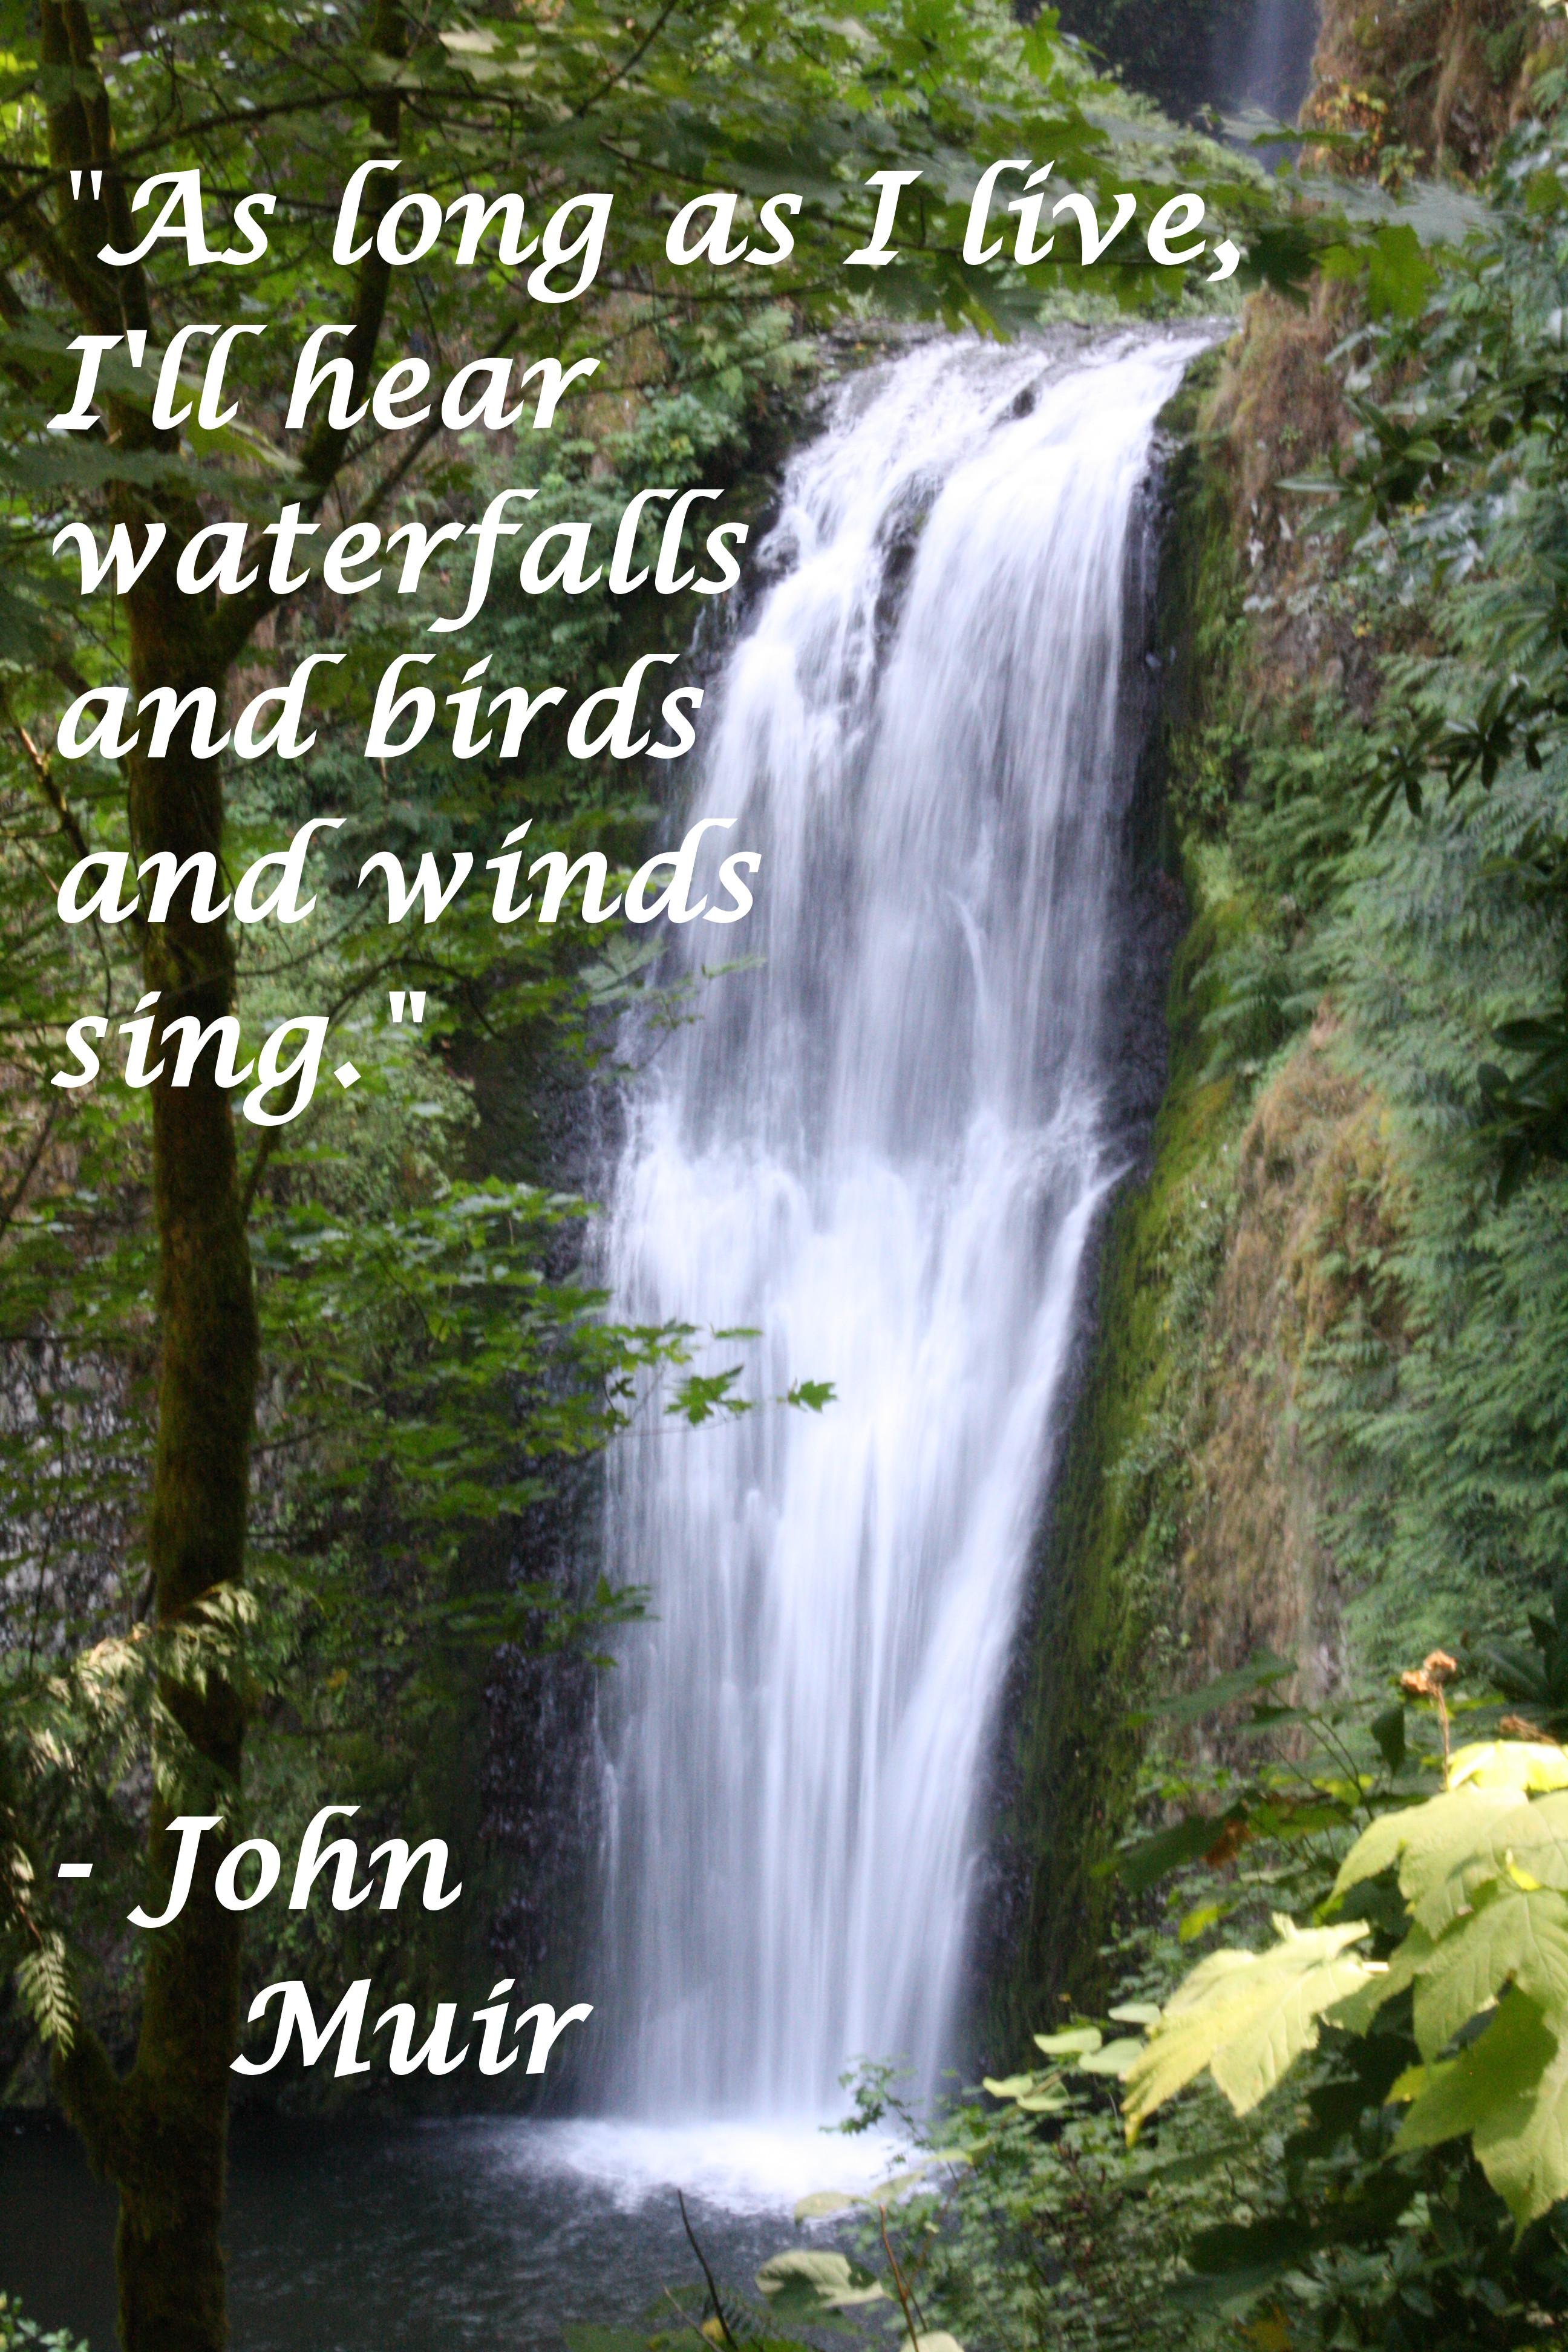 Waterfall With John Muir Quote 2 Tamarascameras